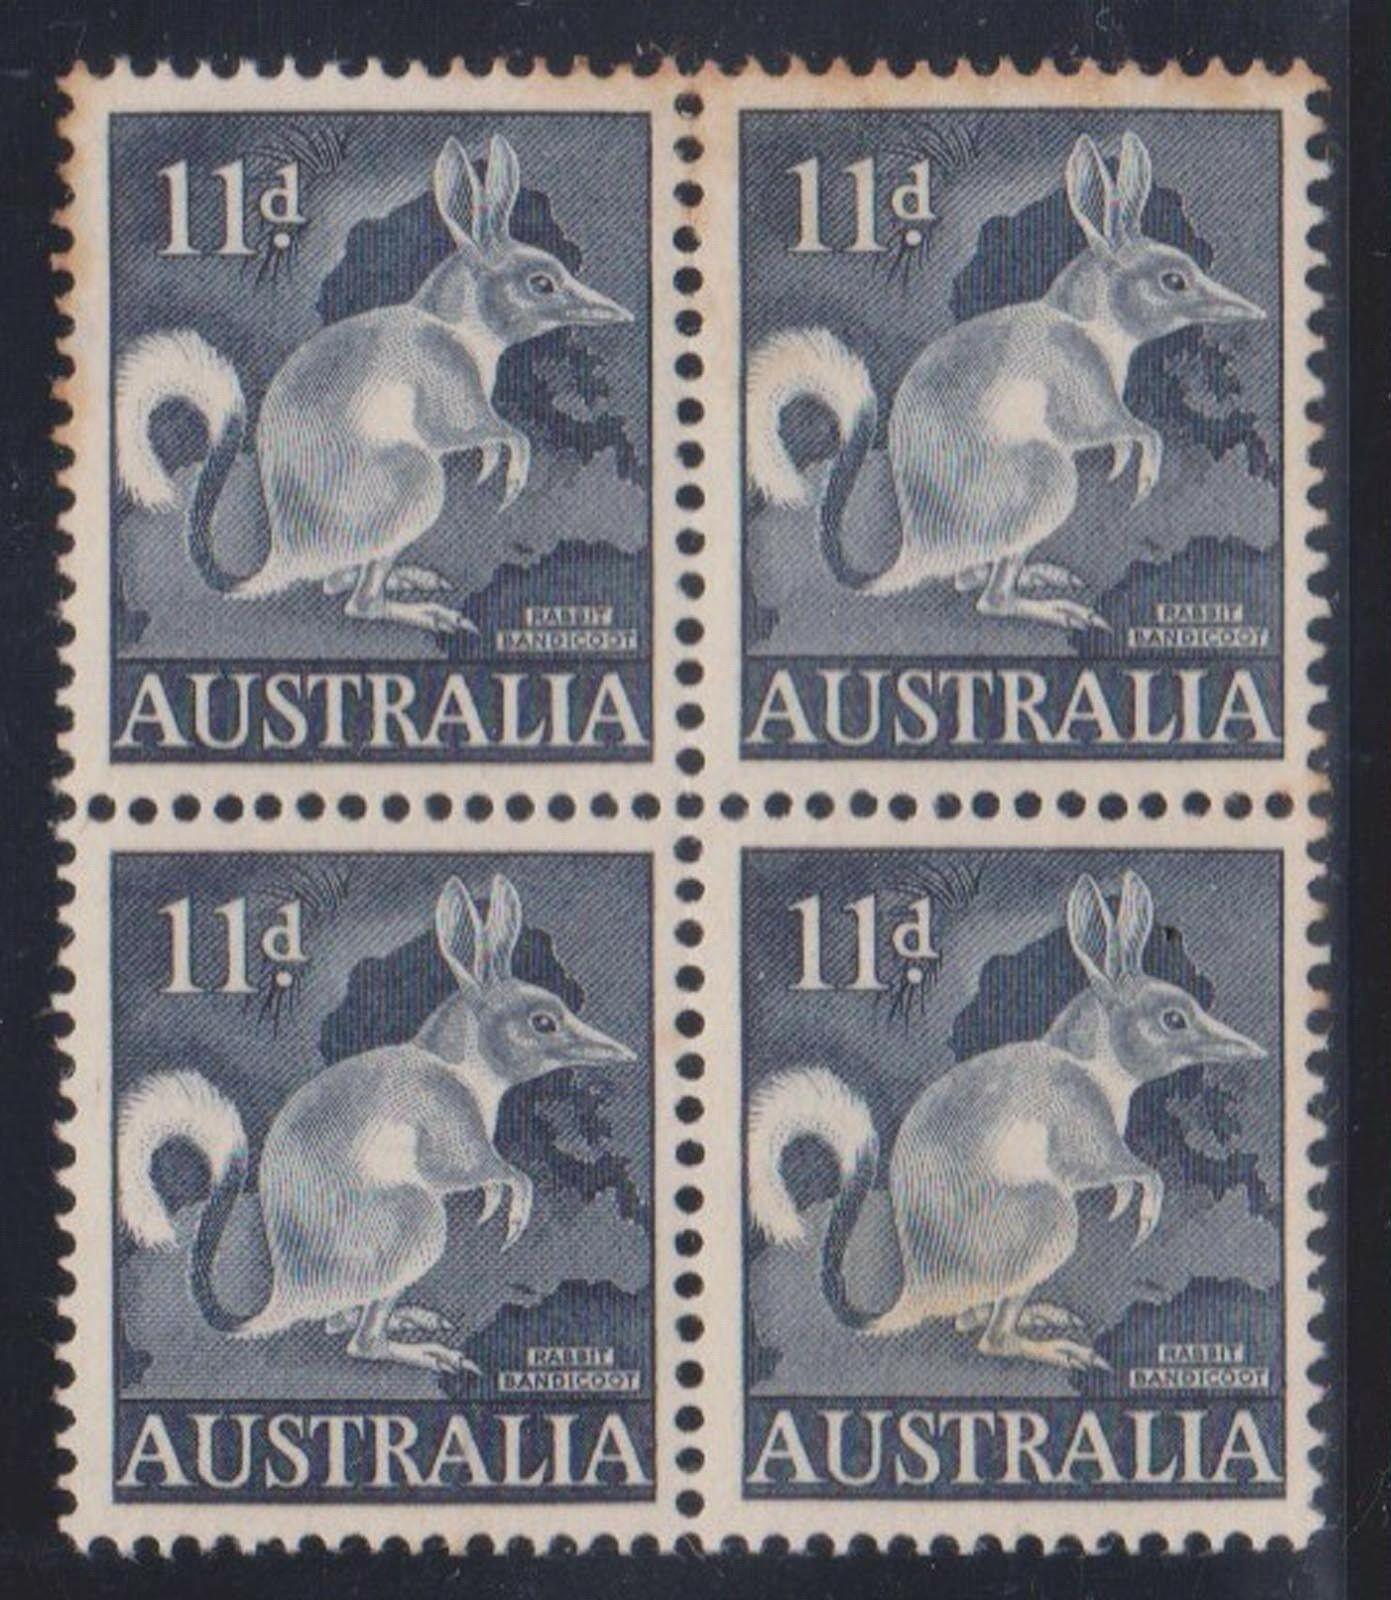 bilby stamp rabbit-eared bandicoot